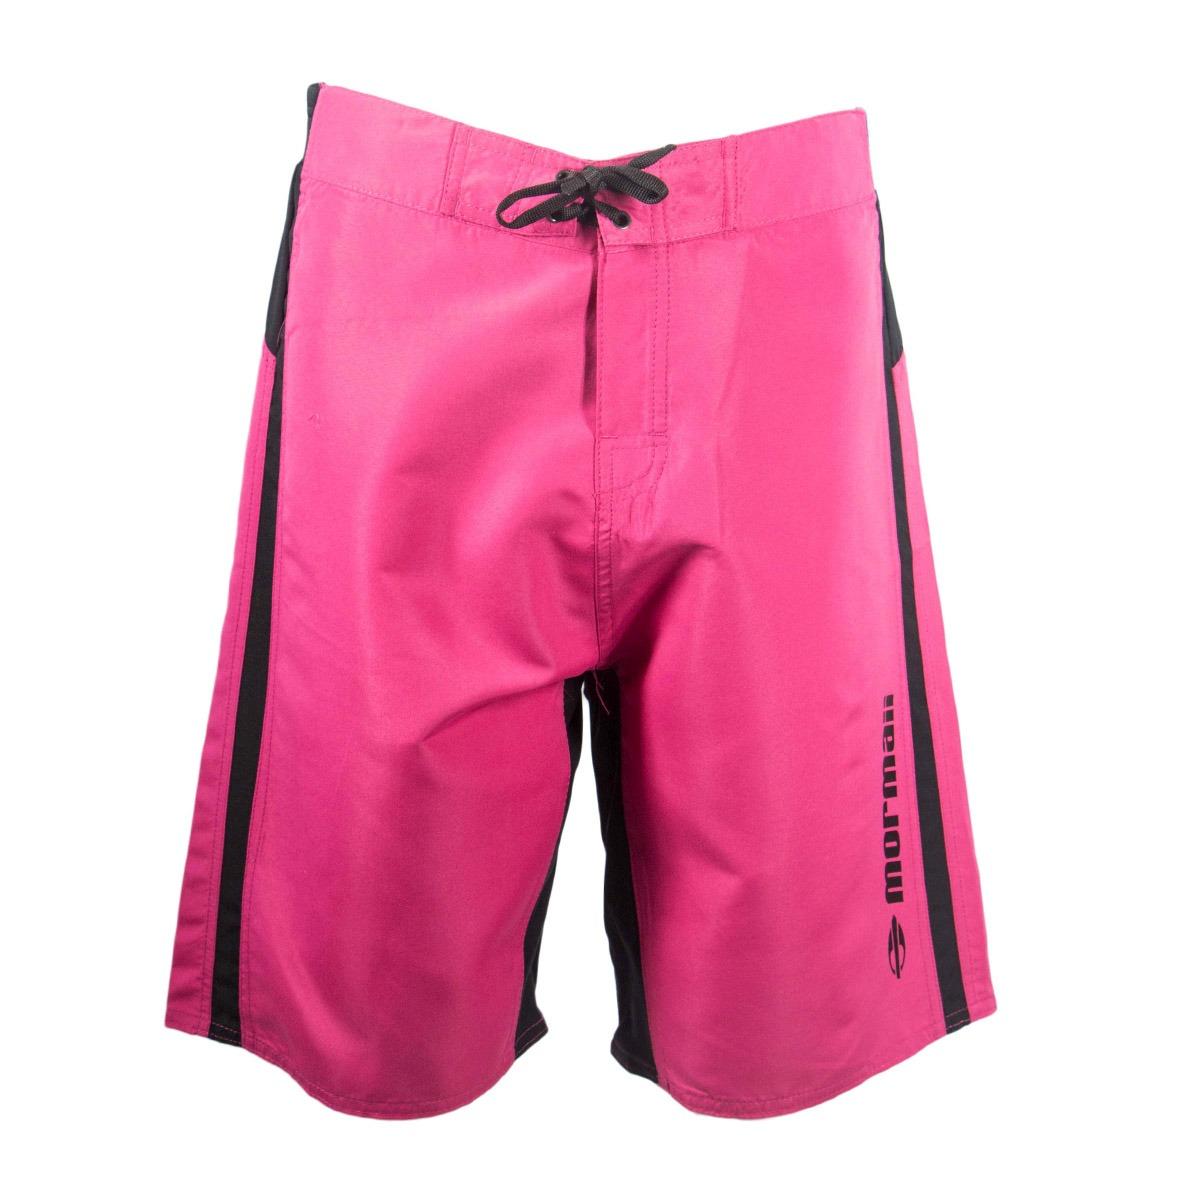 Traje De Baño Mormaii Neo Hombre Rosa -   410,00 en Mercado Libre 063b374bb1